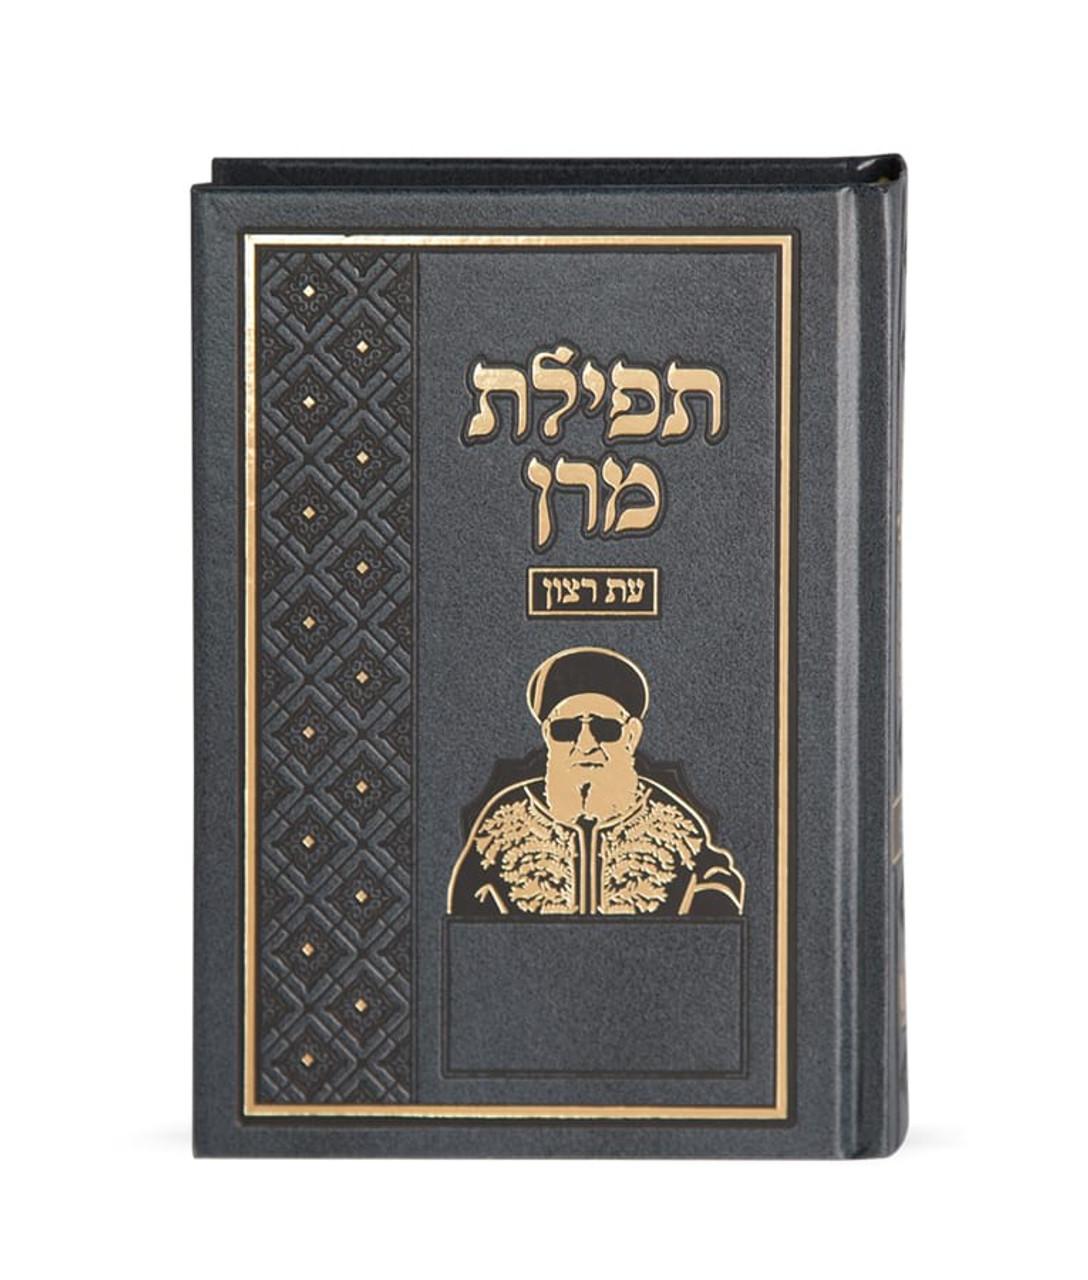 Tefilat Maran Hardcover Siddur - Eidot HaMizrach